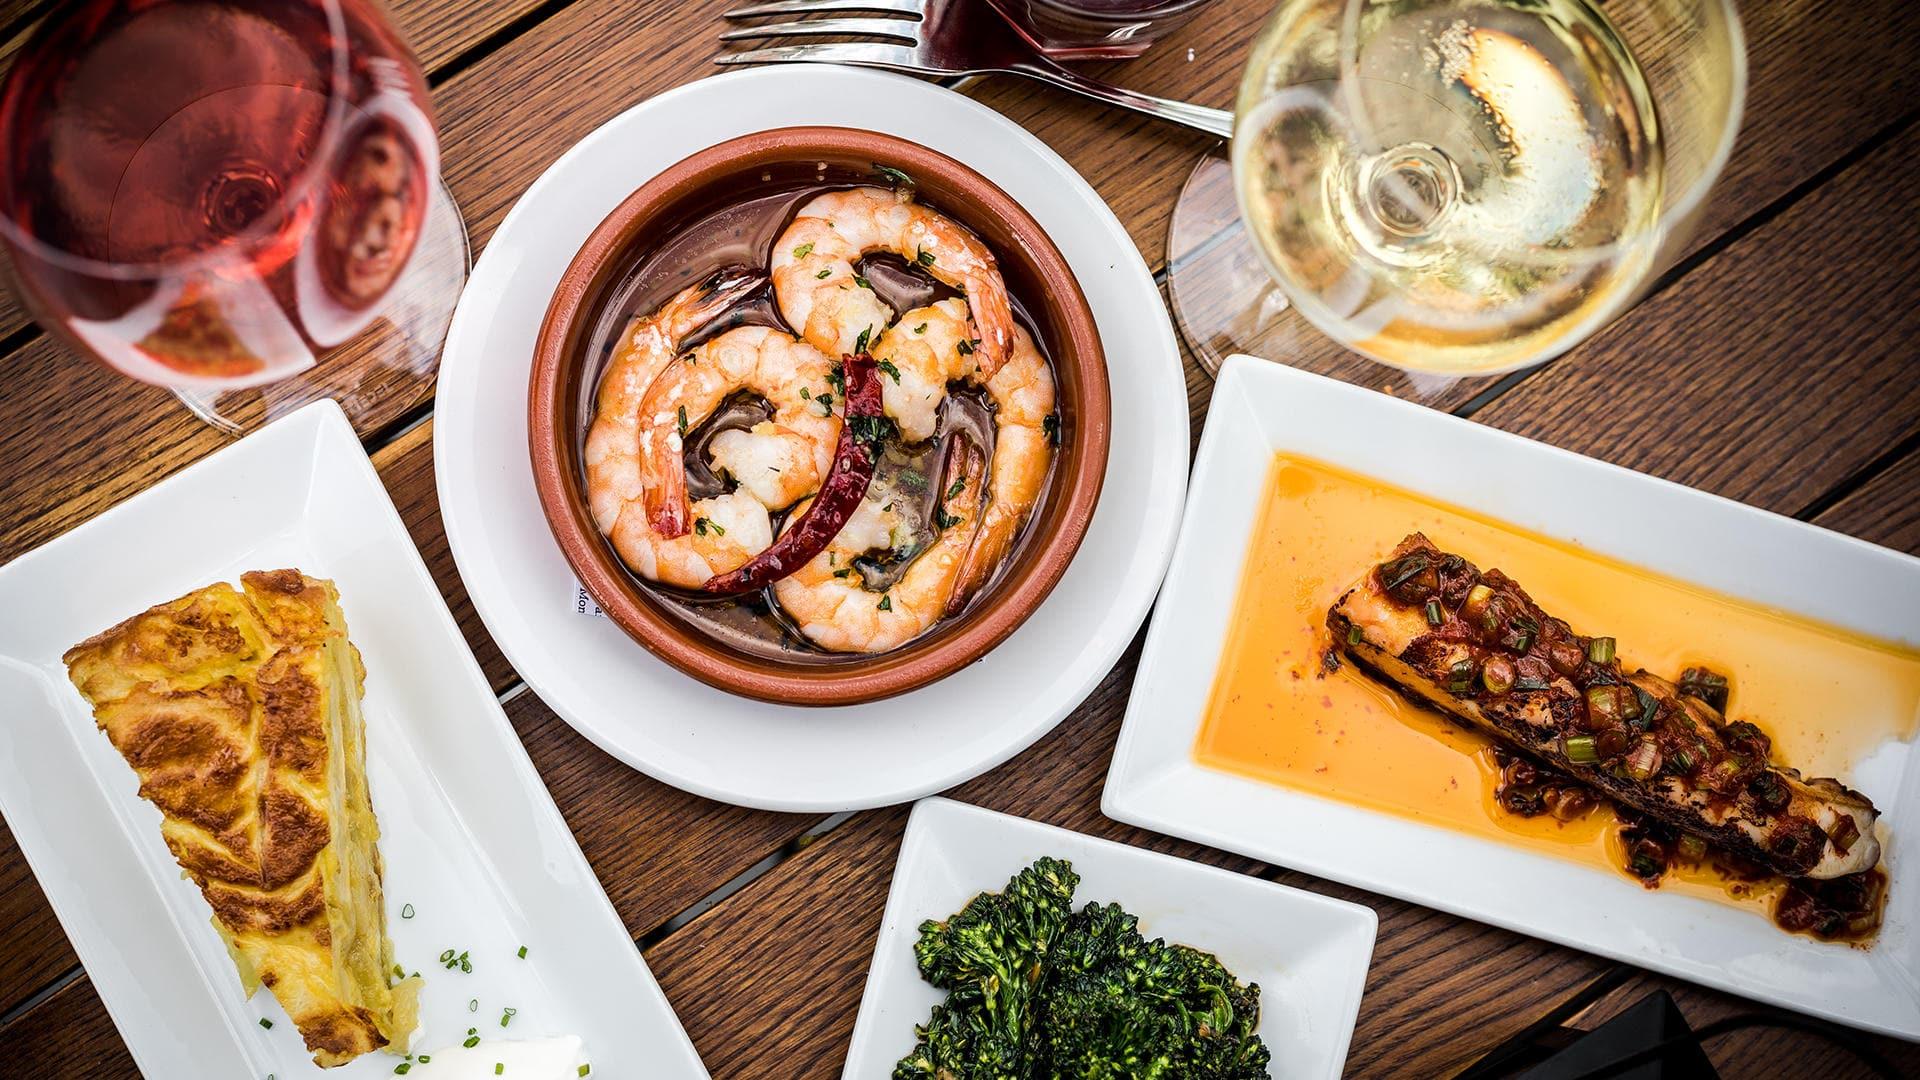 Barcelona Wine Bar Menu Menu For Barcelona Wine Bar Inman Park Atlanta